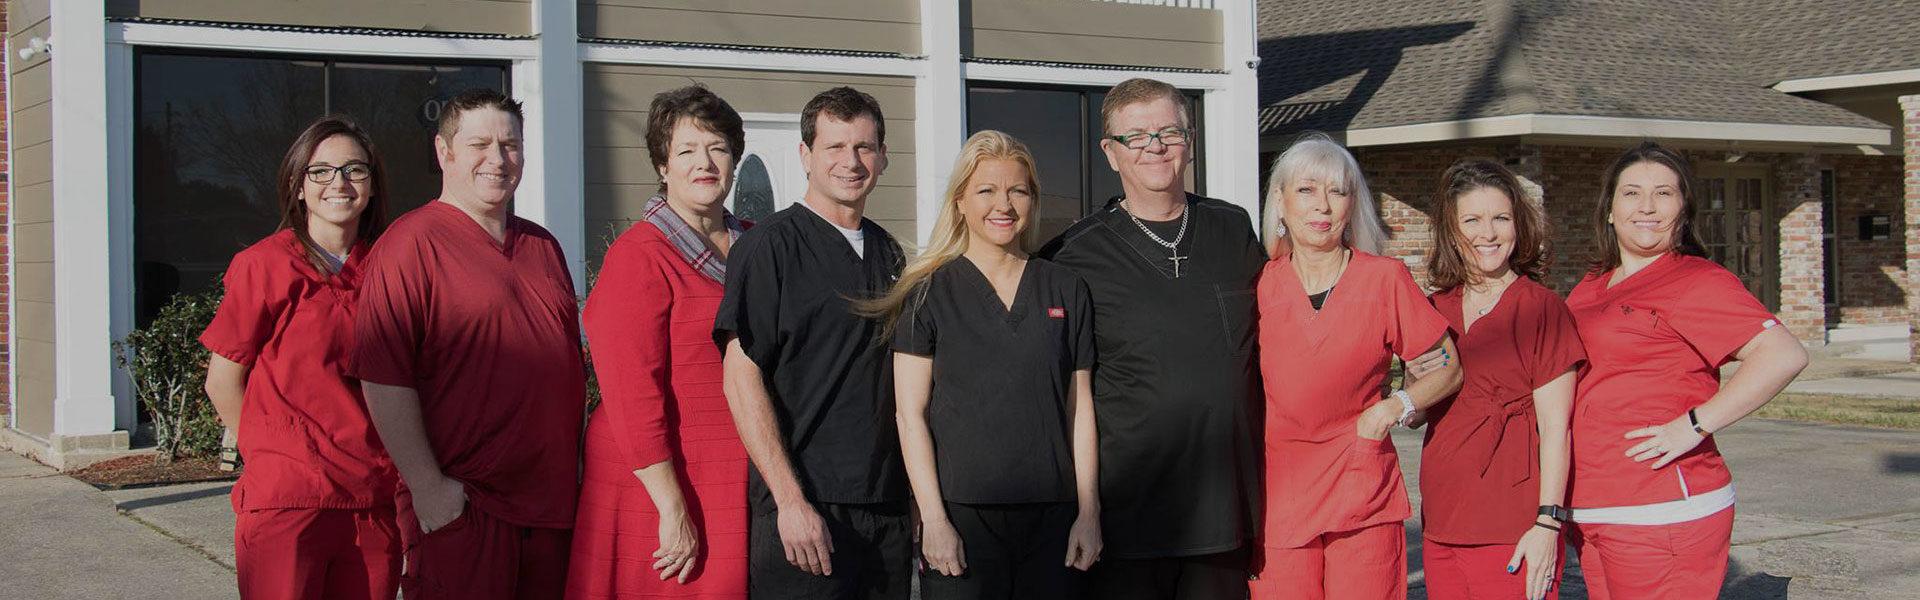 Ozark Chiropractic clinic